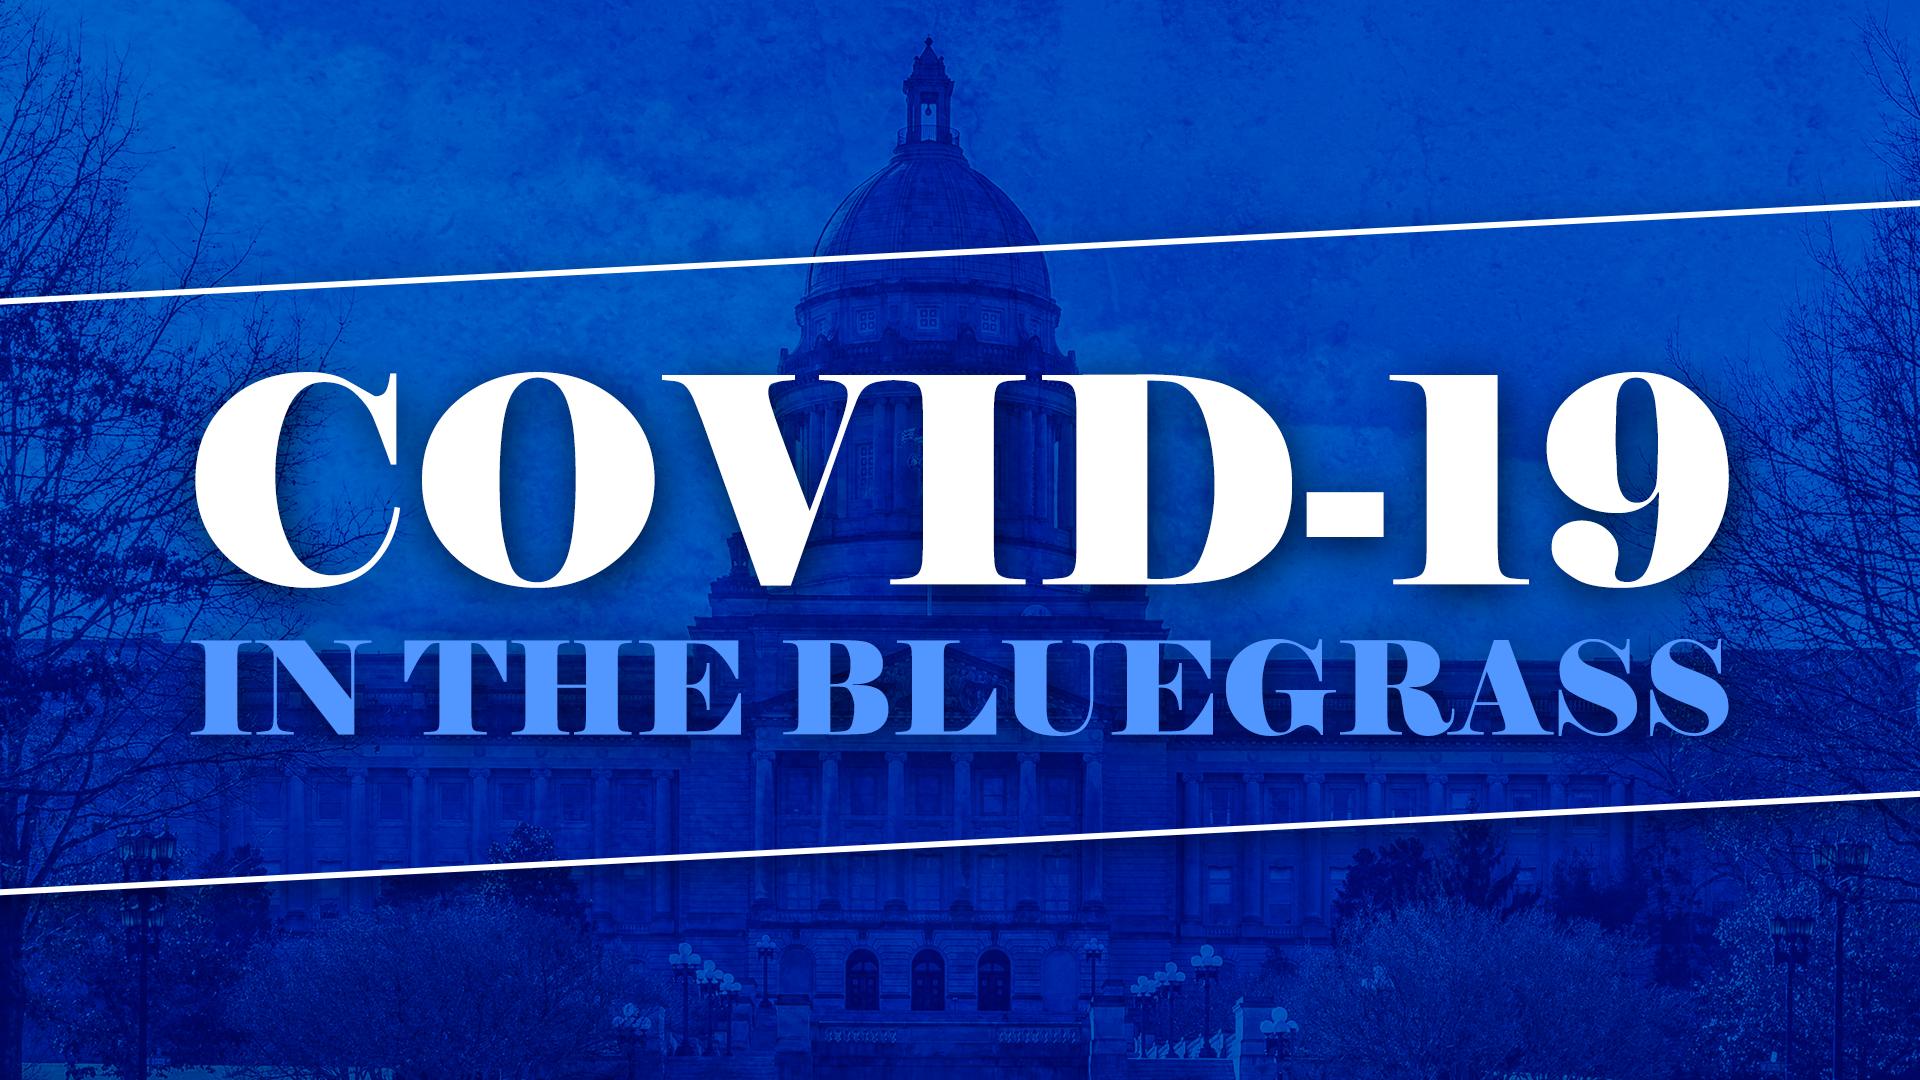 Covid Bluegrass